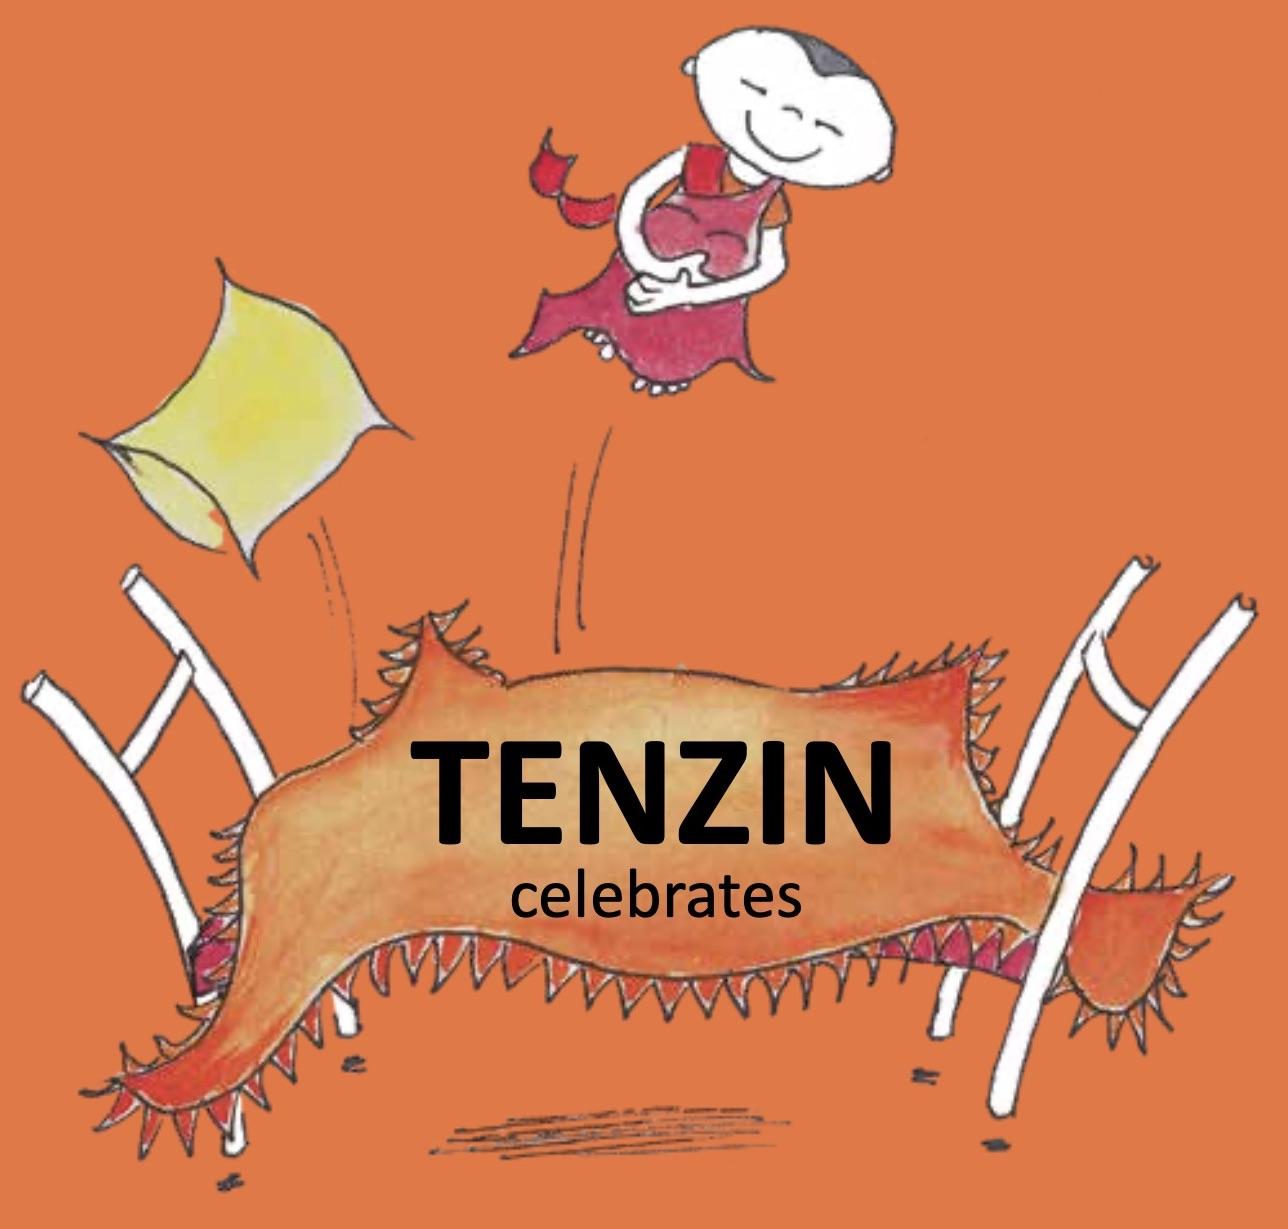 Tenzin celebrates cover website klein